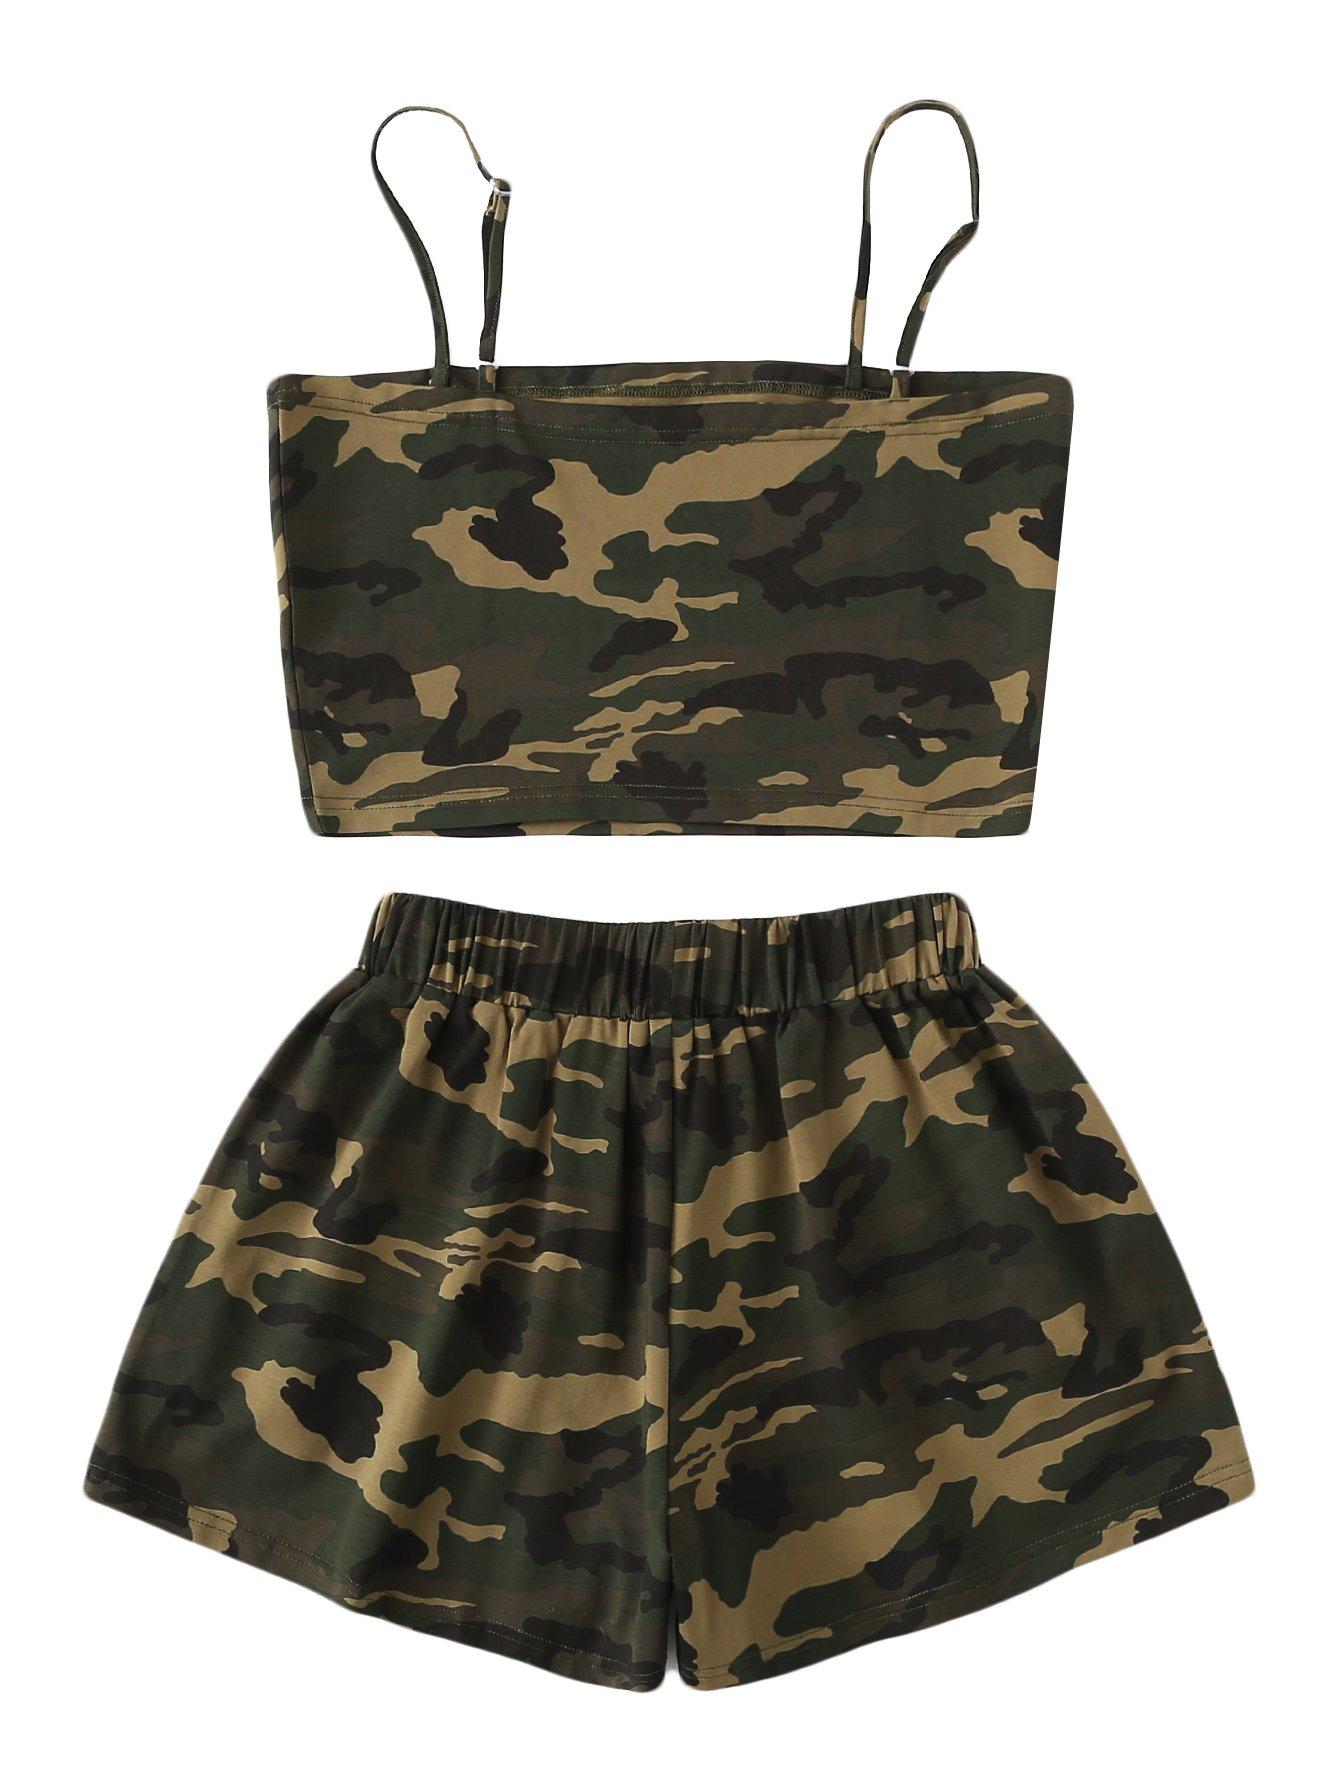 SweatyRocks Women's 2 Piece Set Halter Crop Top and Shorts Set Camo L